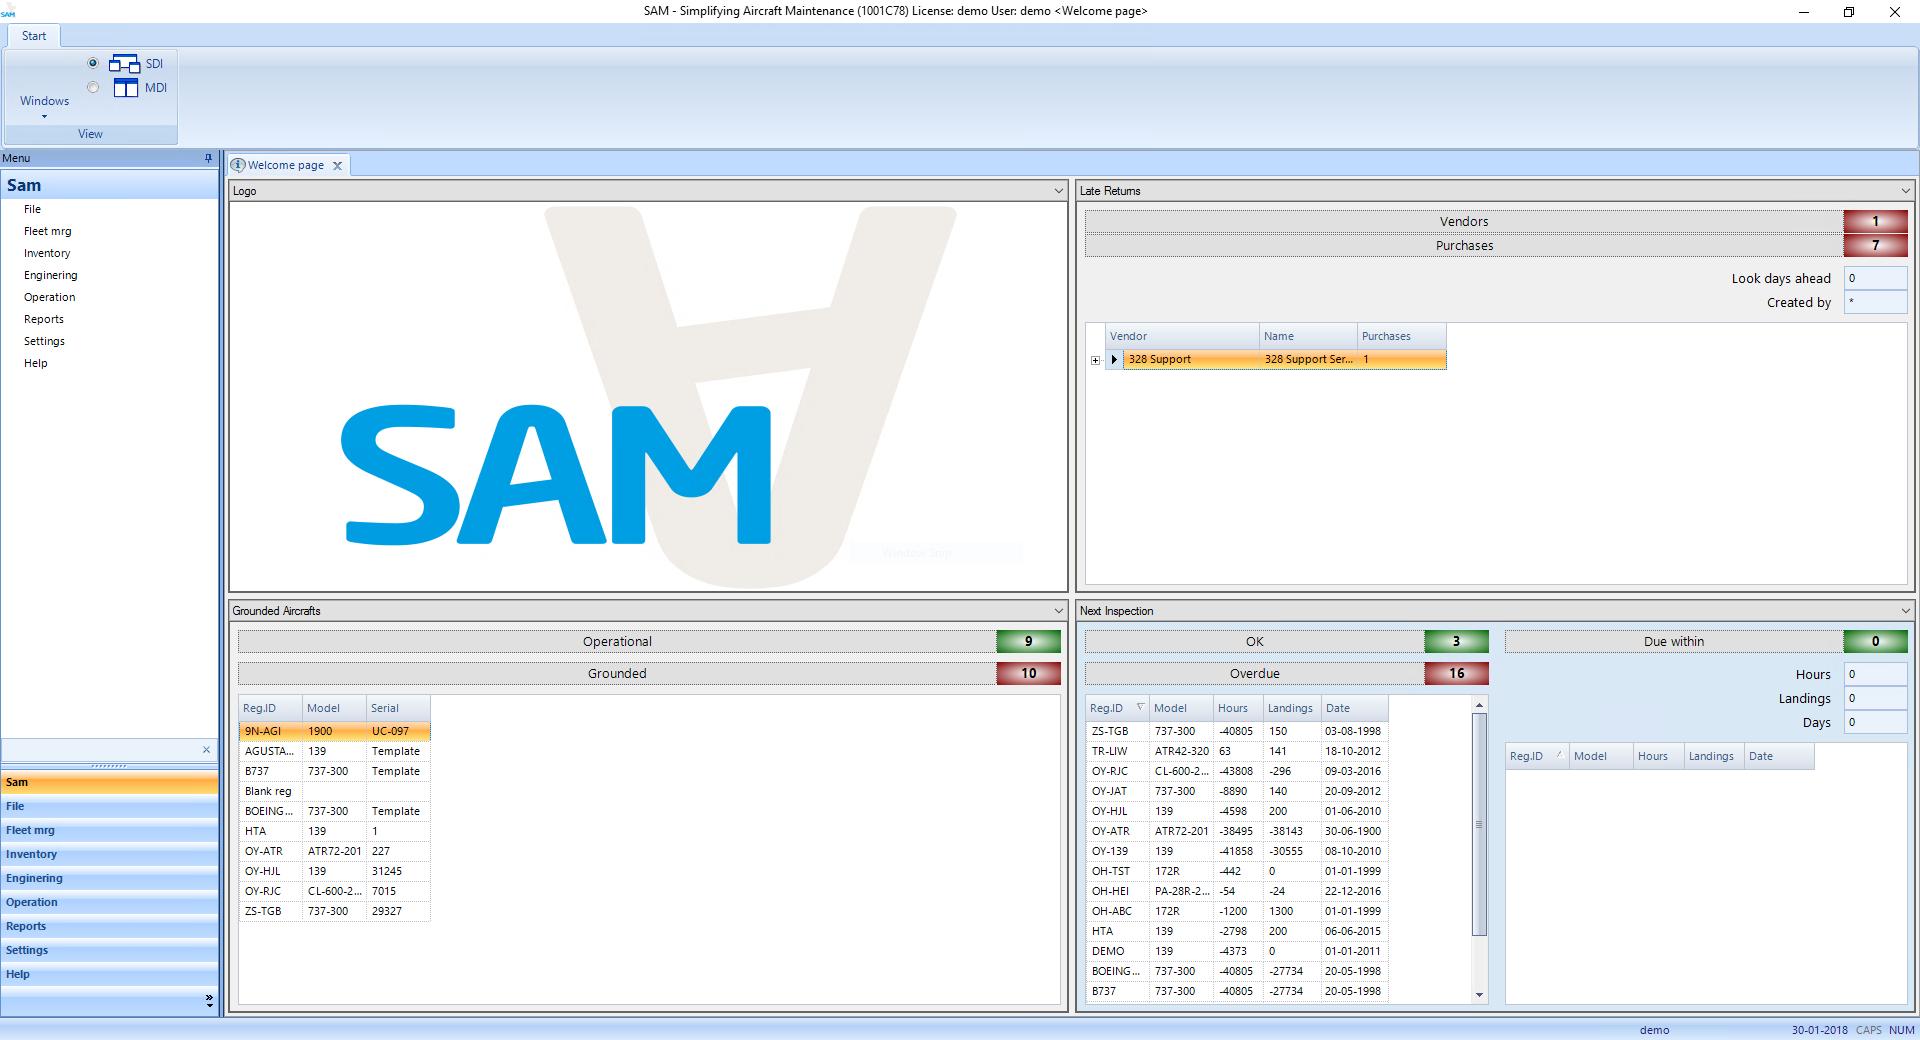 SAM Aviation Maintenance Software welcome page screenshot